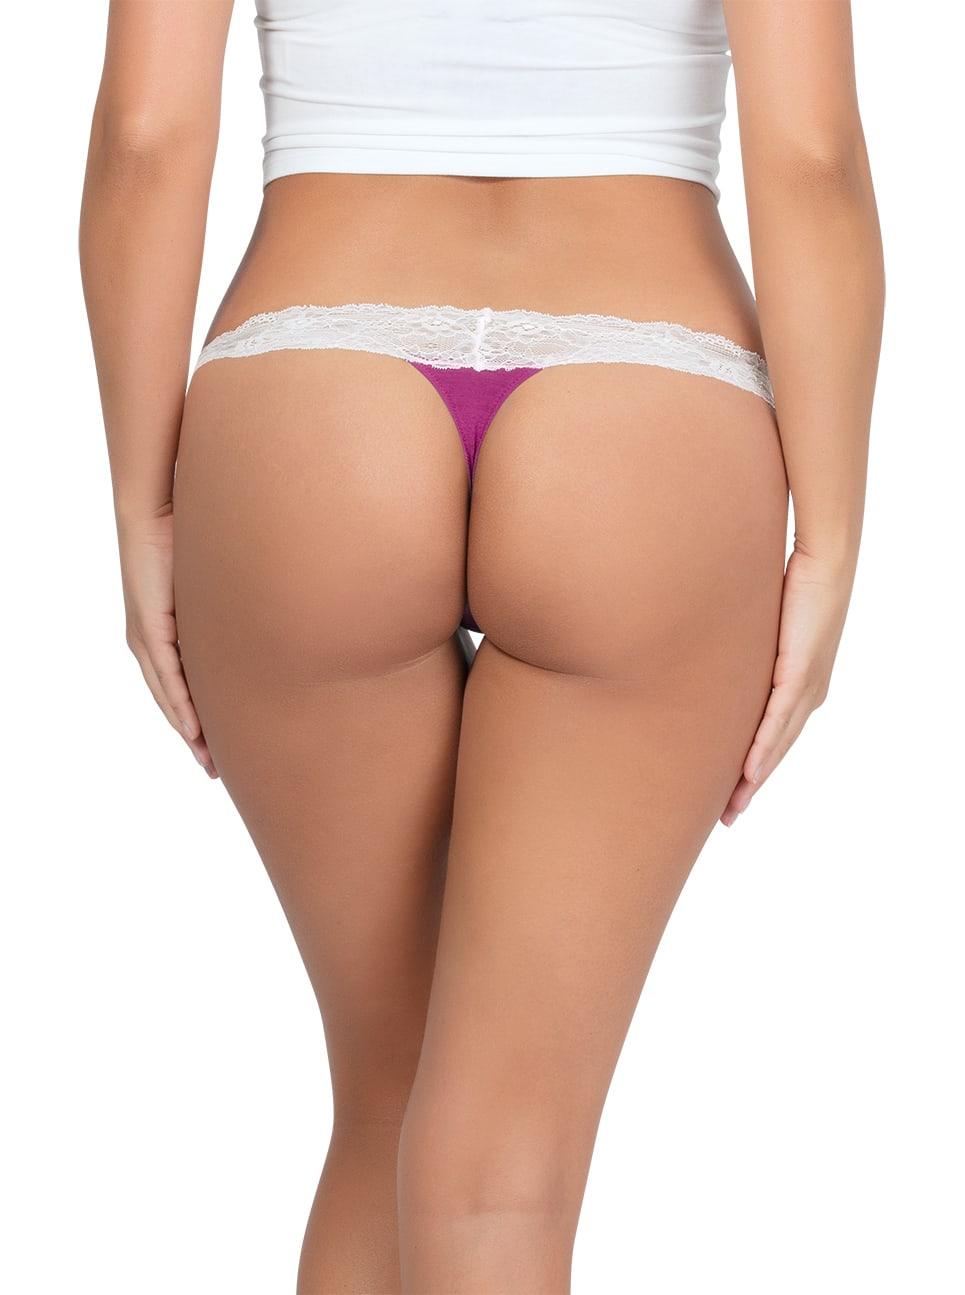 PARFAIT ParfaitPanty SoEssential ThongPP403 WildPinkIvory Back - Panty So Essential Thong - Wild Pink - PP403